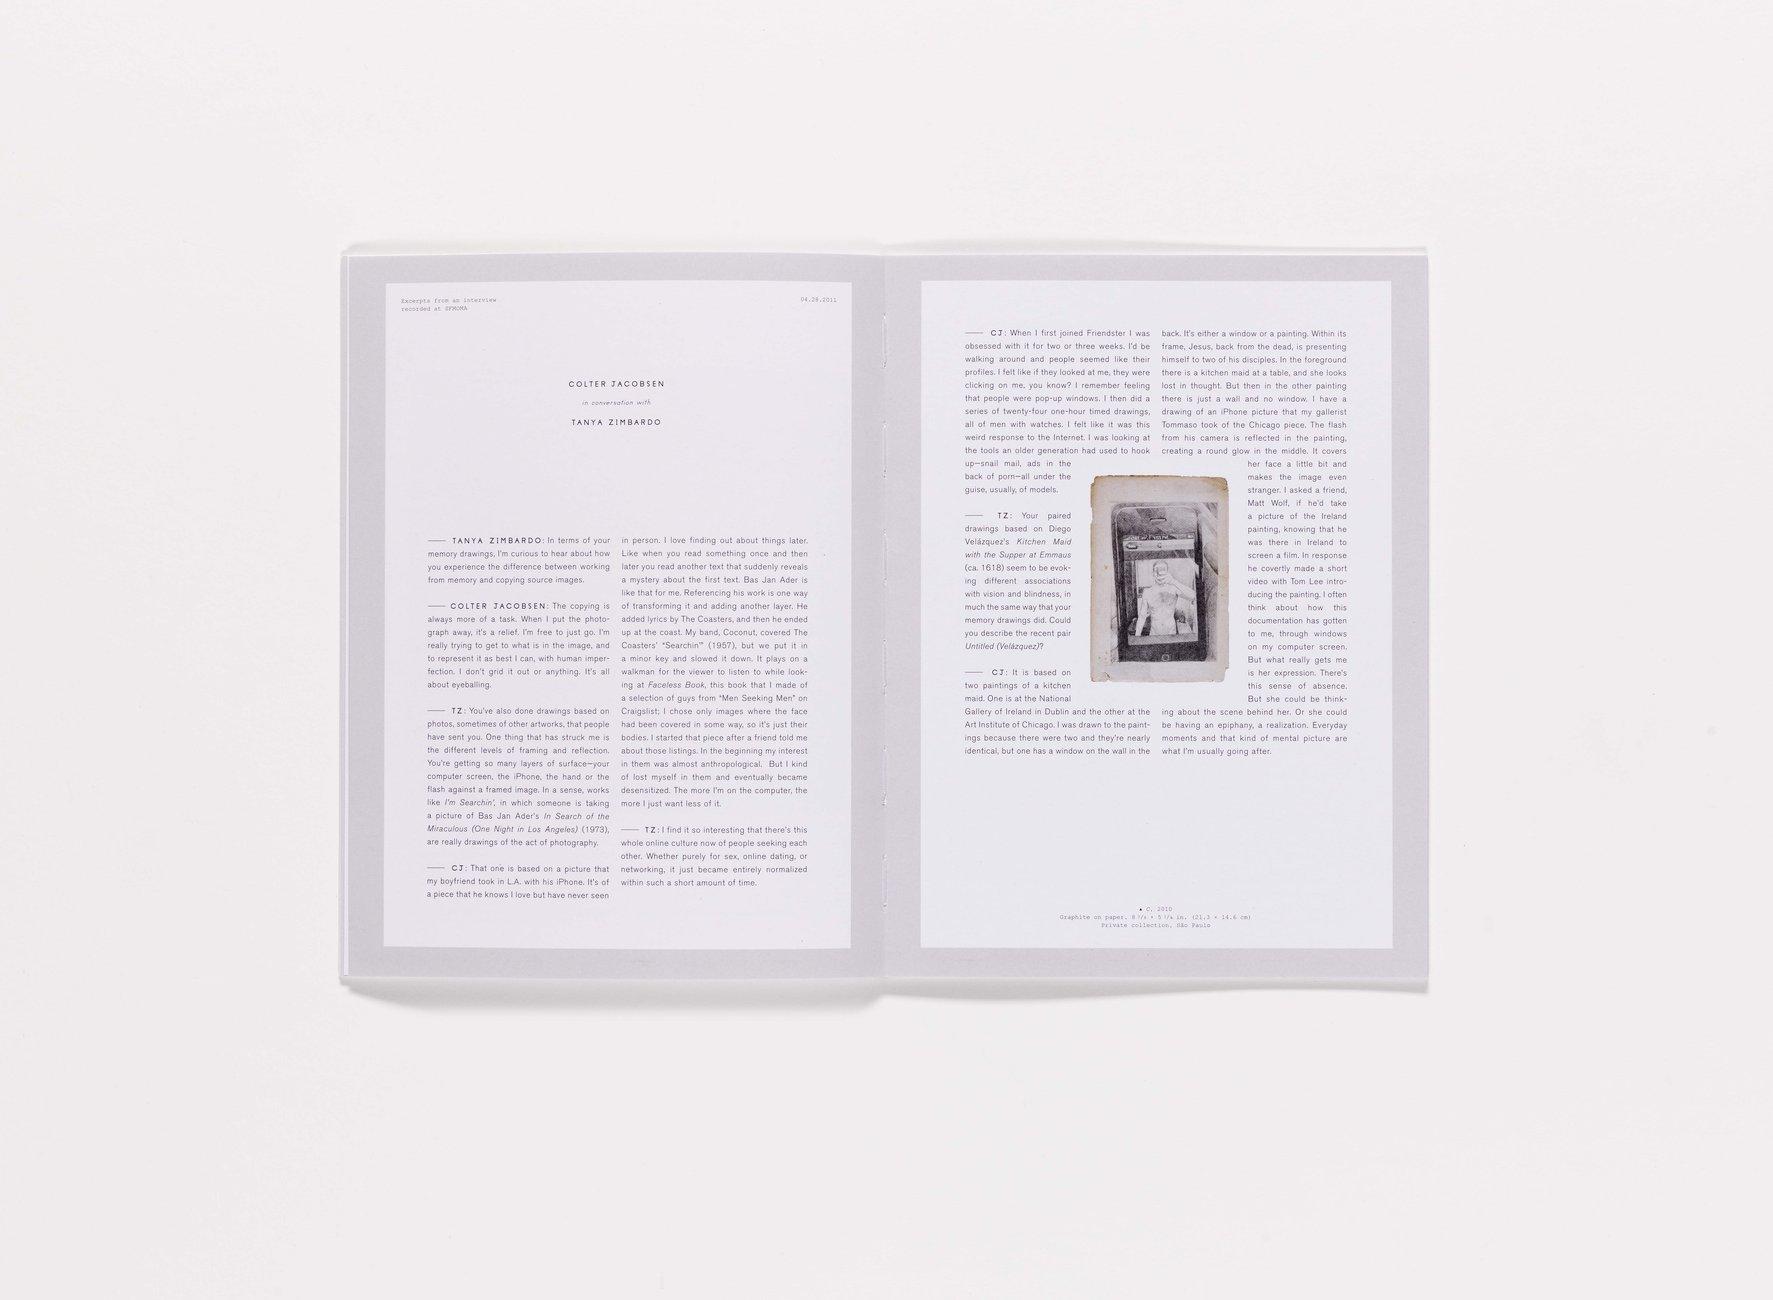 2010 SECA Art Award publication pages 18-19